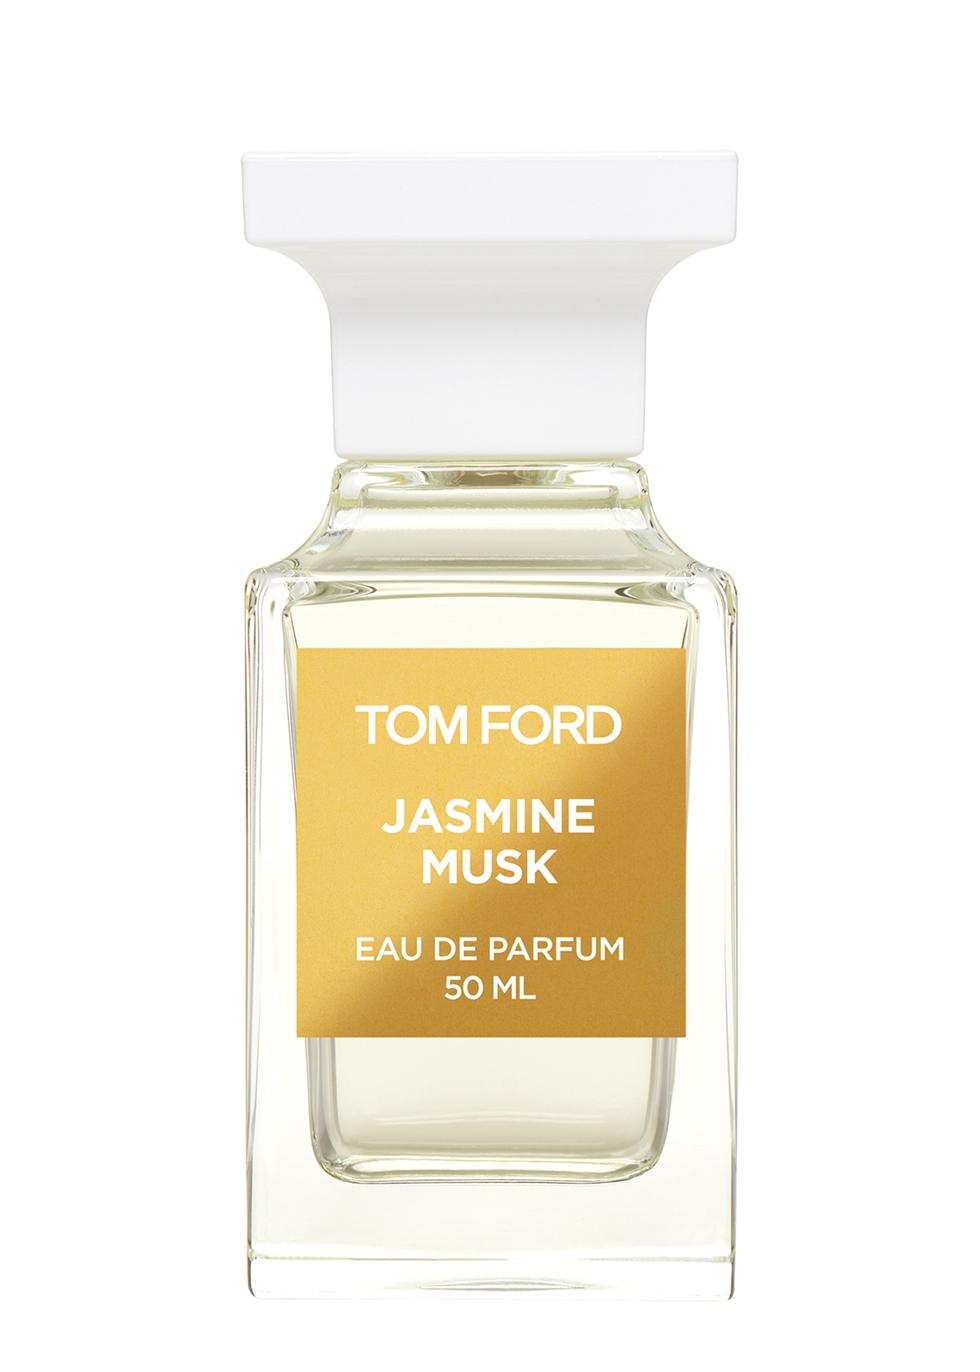 Jasmine Nichols Tom Ford De Eau 50ml Parfum Musk Harvey dBeroxWC